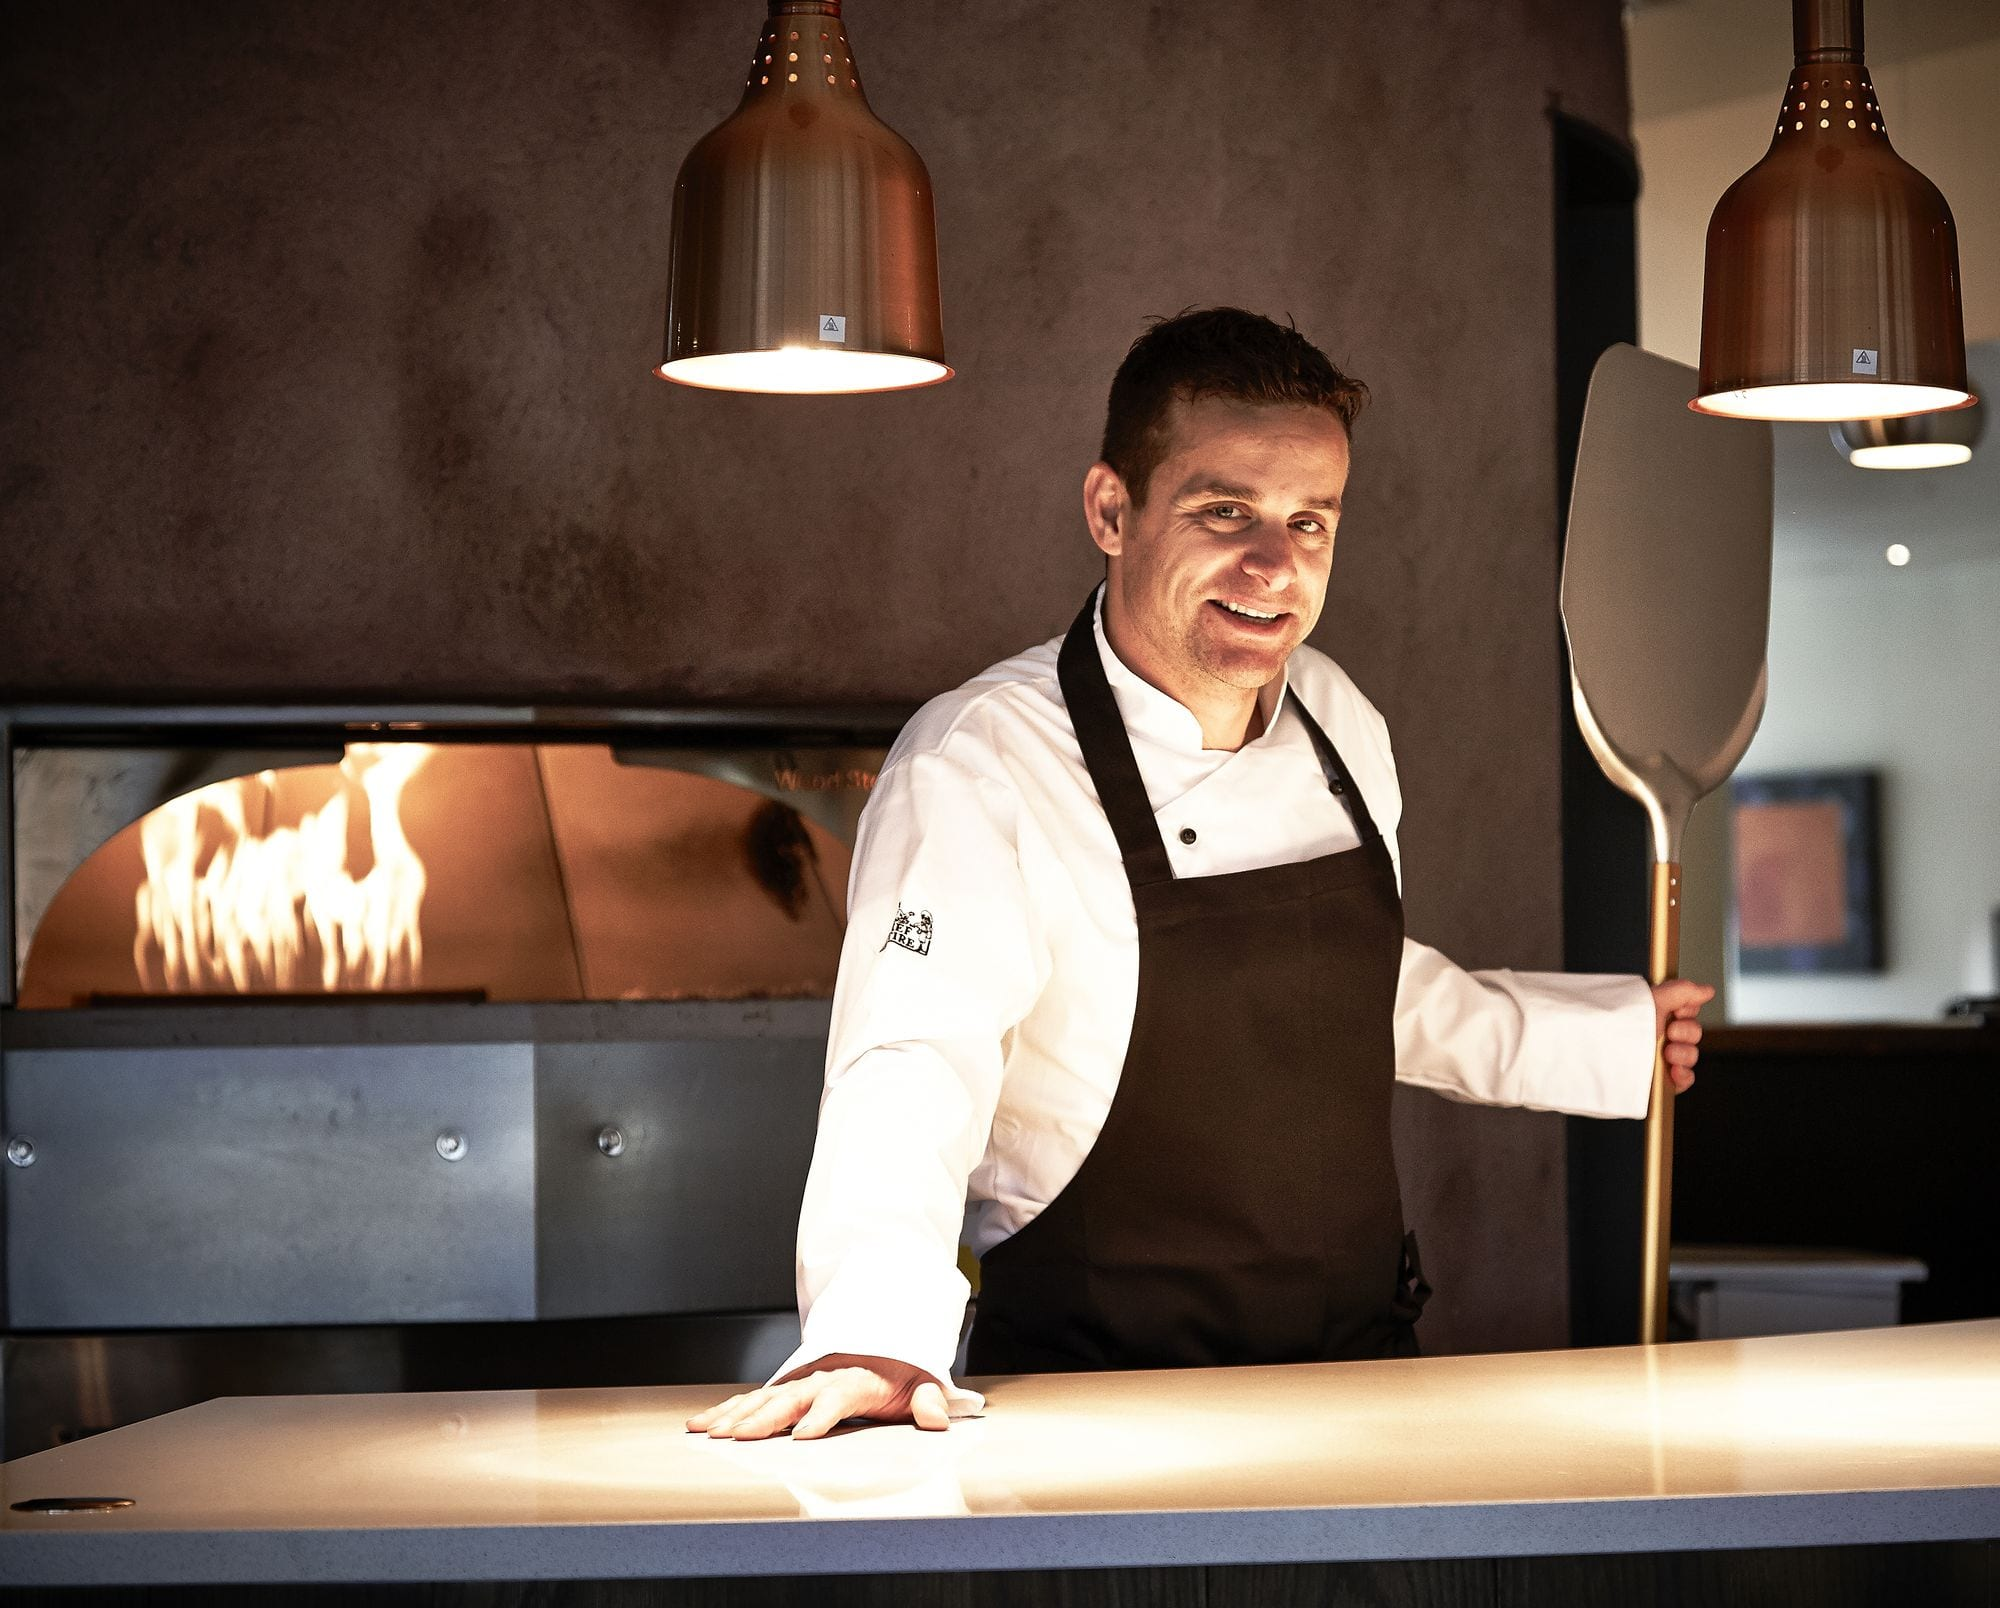 Clayton_Hotel_Liffey_Valley_Gusto__pizza_chef